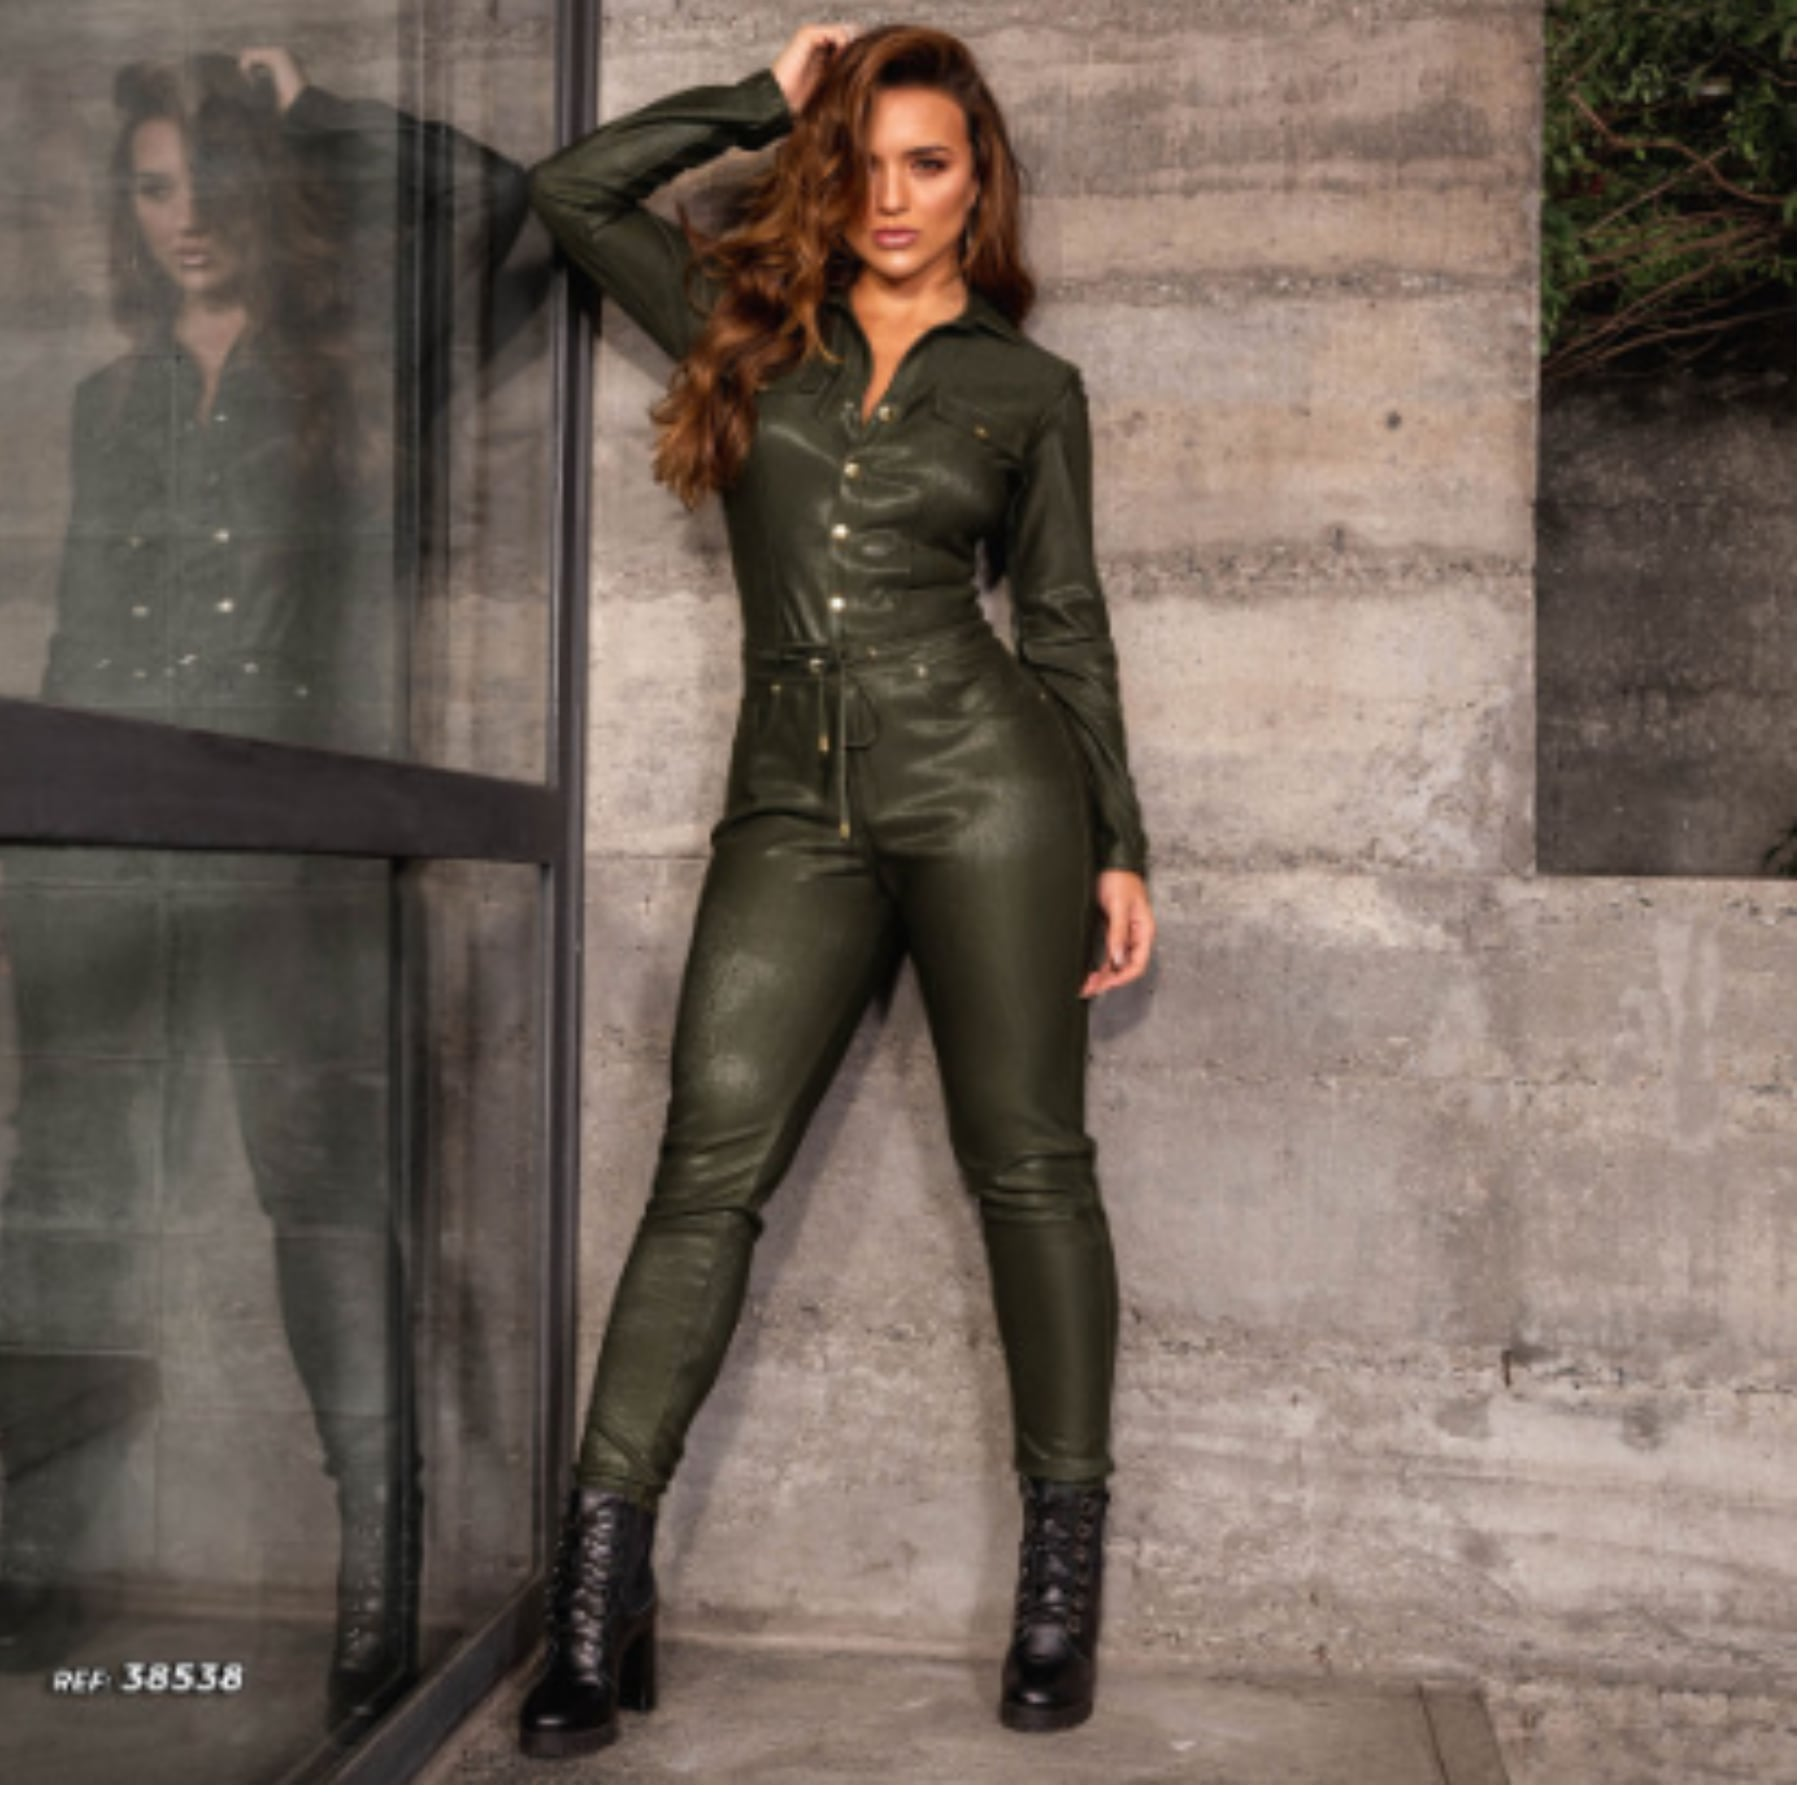 Macacão Jeans Feminino Longo Verde Militar Pit Bull Jeans